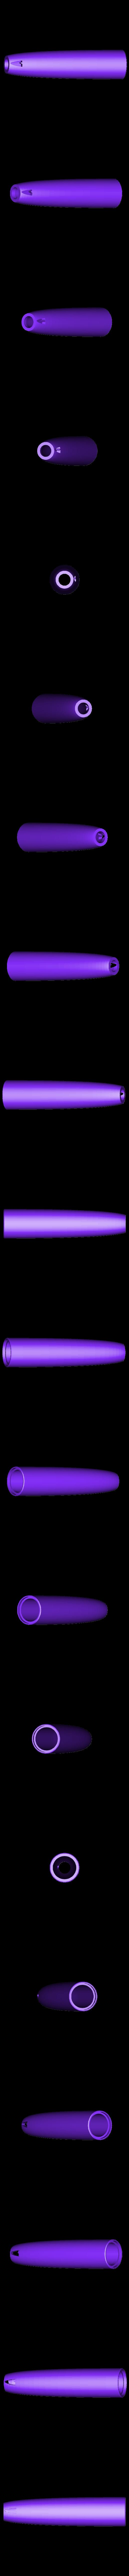 Skuwka.stl Télécharger fichier STL gratuit Stylo-plume • Plan à imprimer en 3D, kpawel